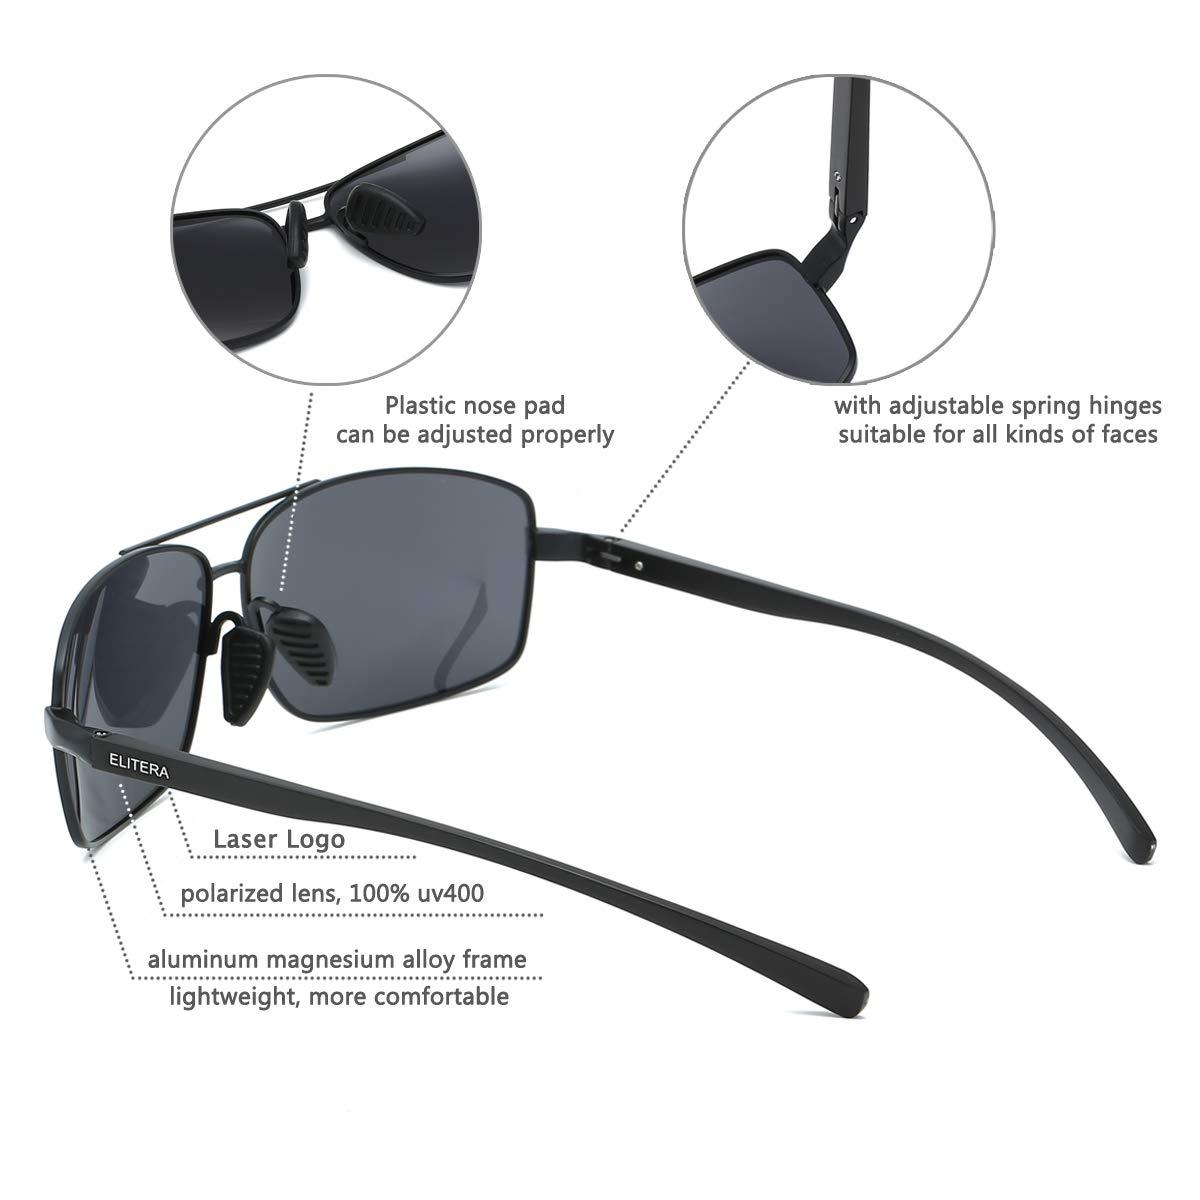 efffc7fc62 Amazon.com  ELITERA Lightweight Square Polarized Sunglasses For Men UV400  protection E2458 (black black gray